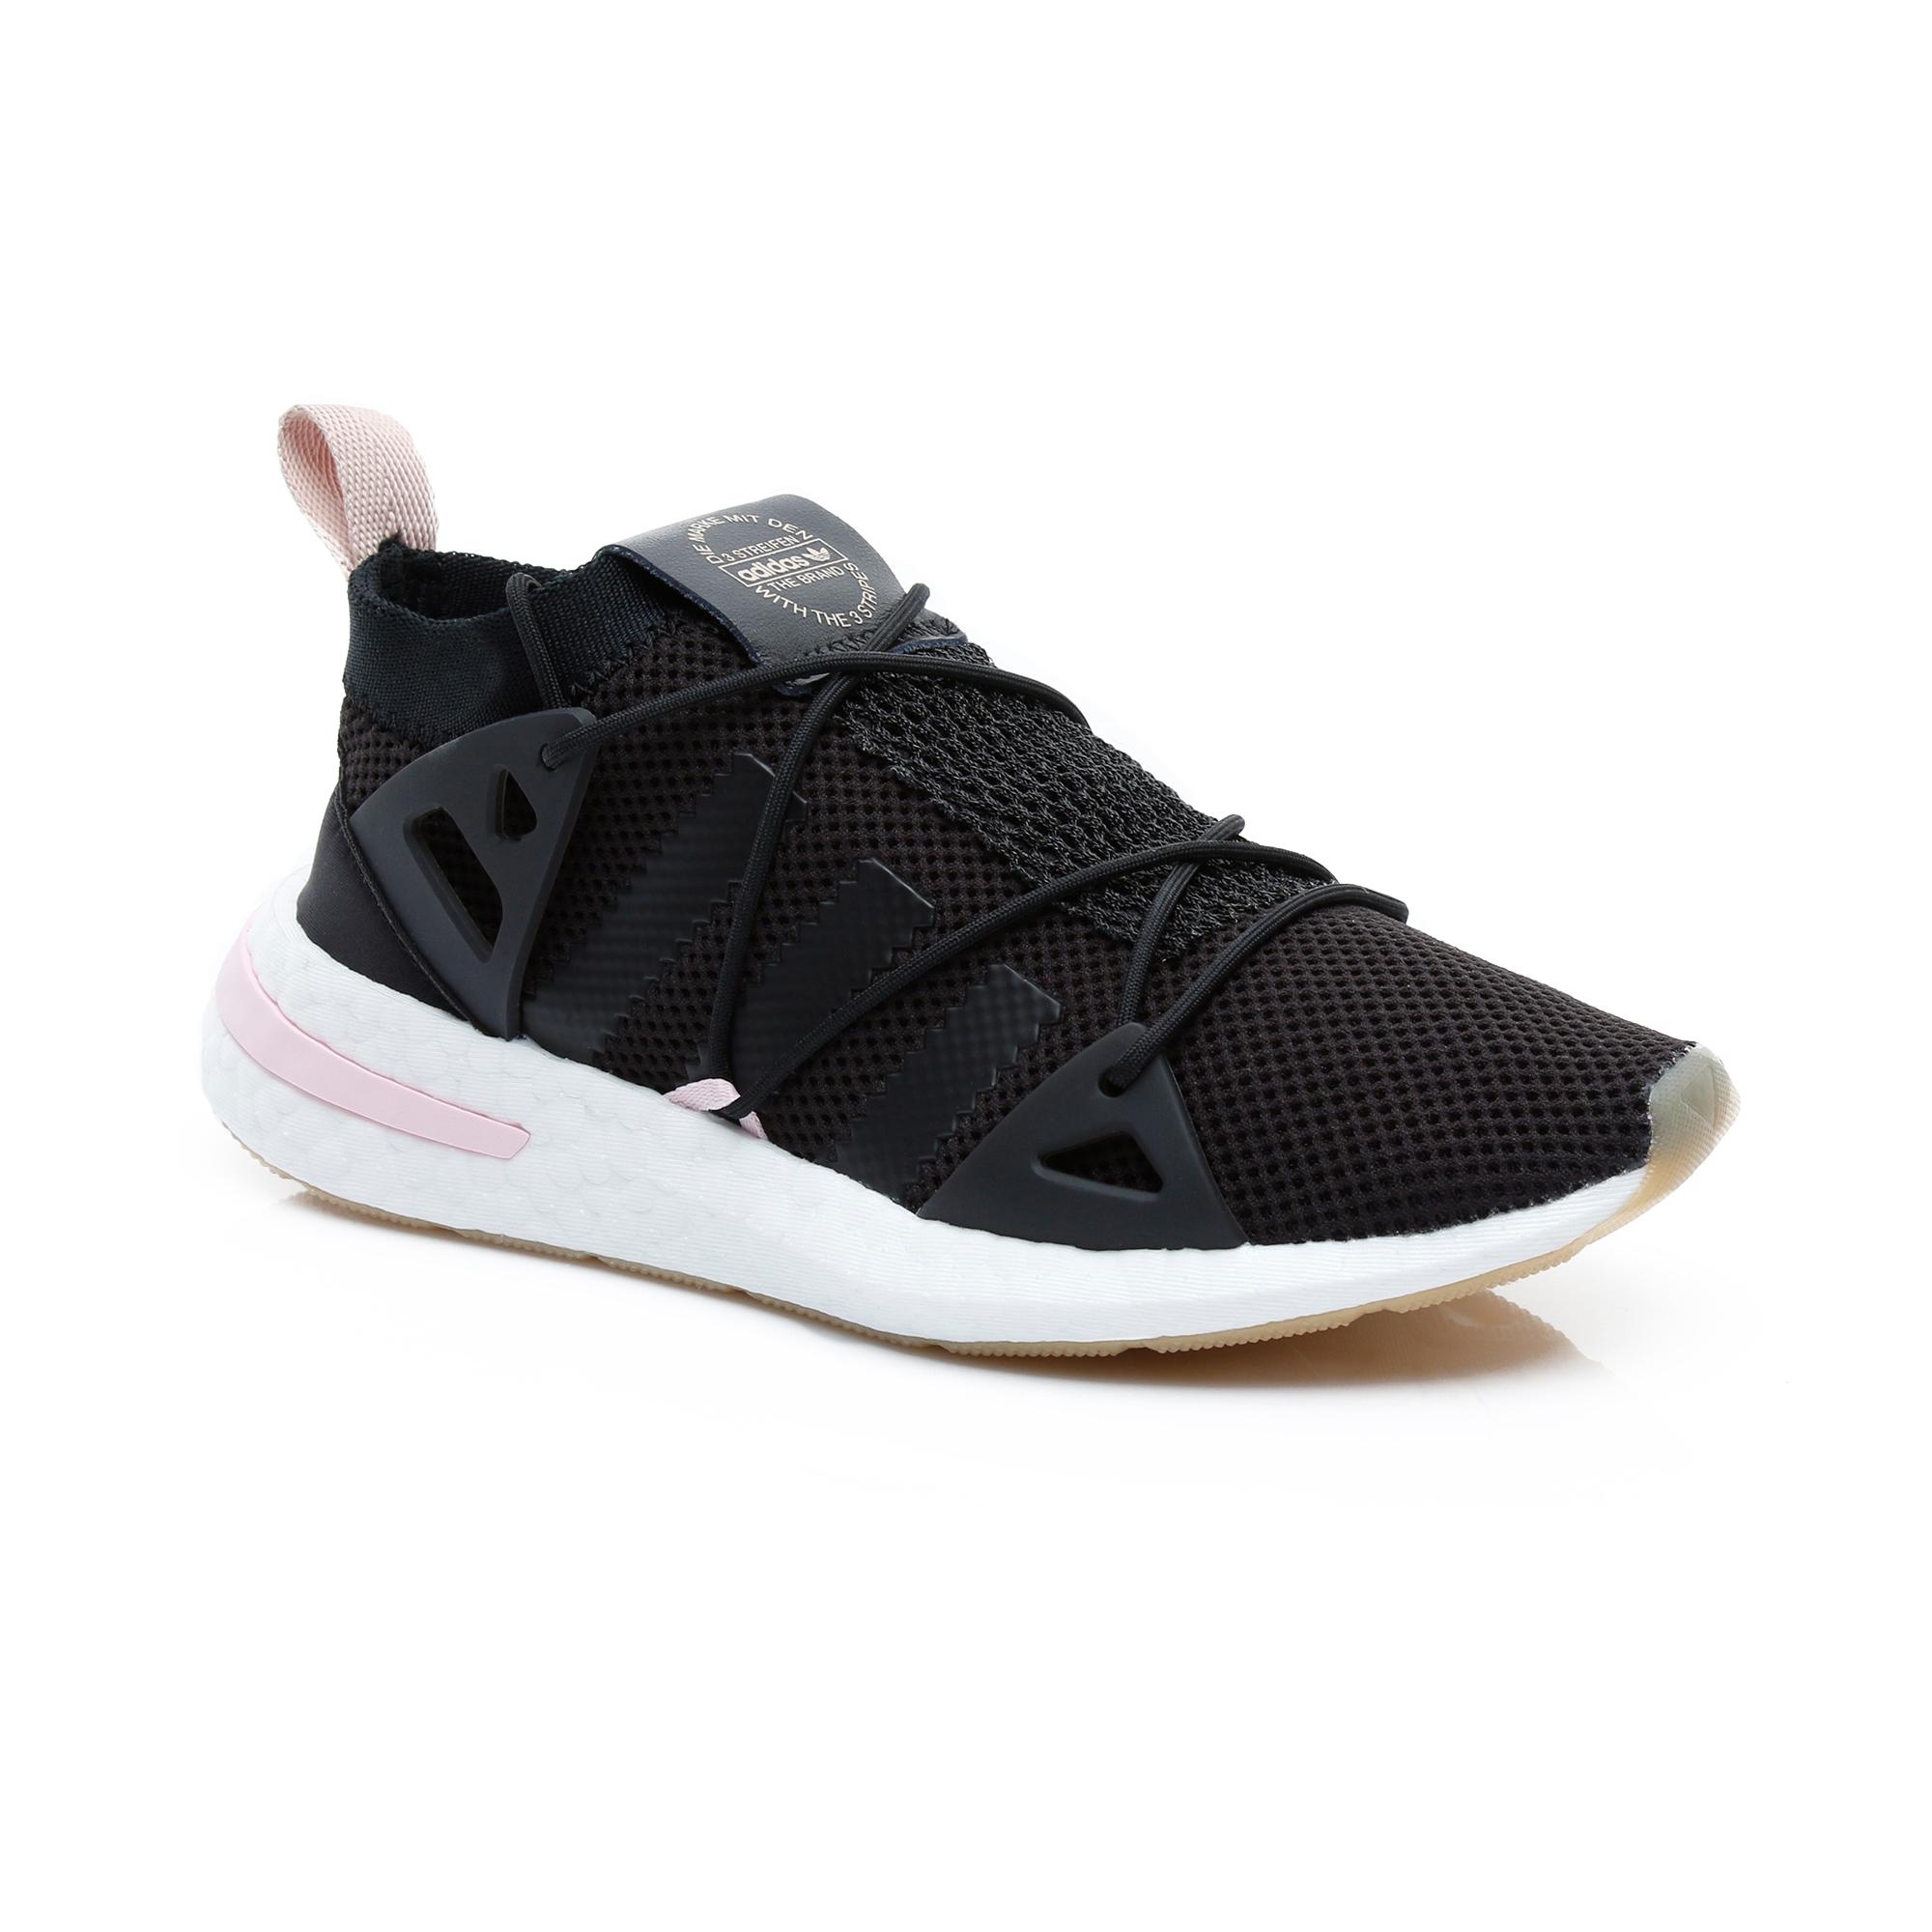 adidas Originals Arkyn Kadın Siyah Spor Ayakkabı